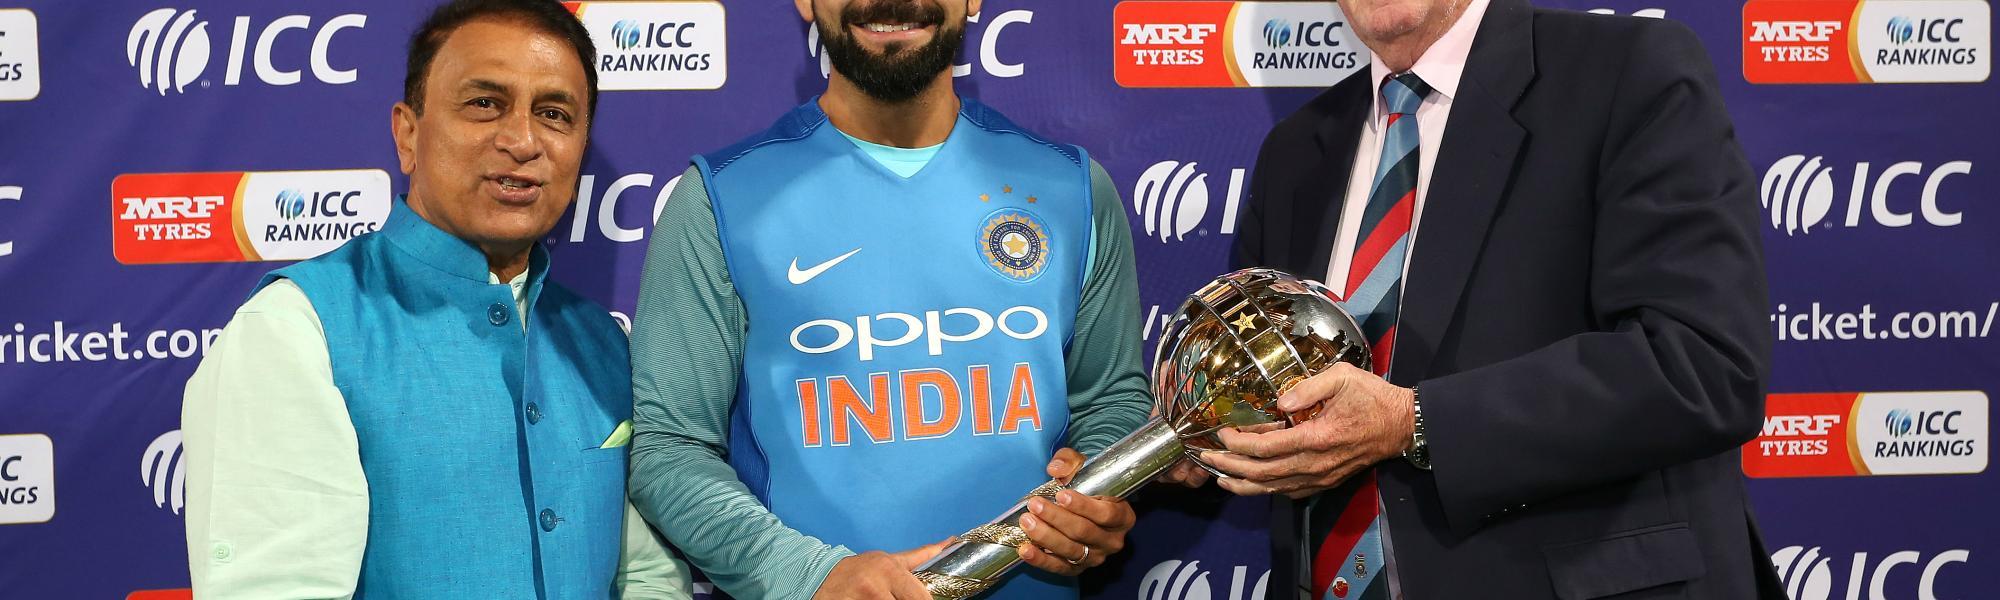 Sunil Gavaskar and Graeme Pollock present Indian captain Virat Kohli the ICC Test Mace